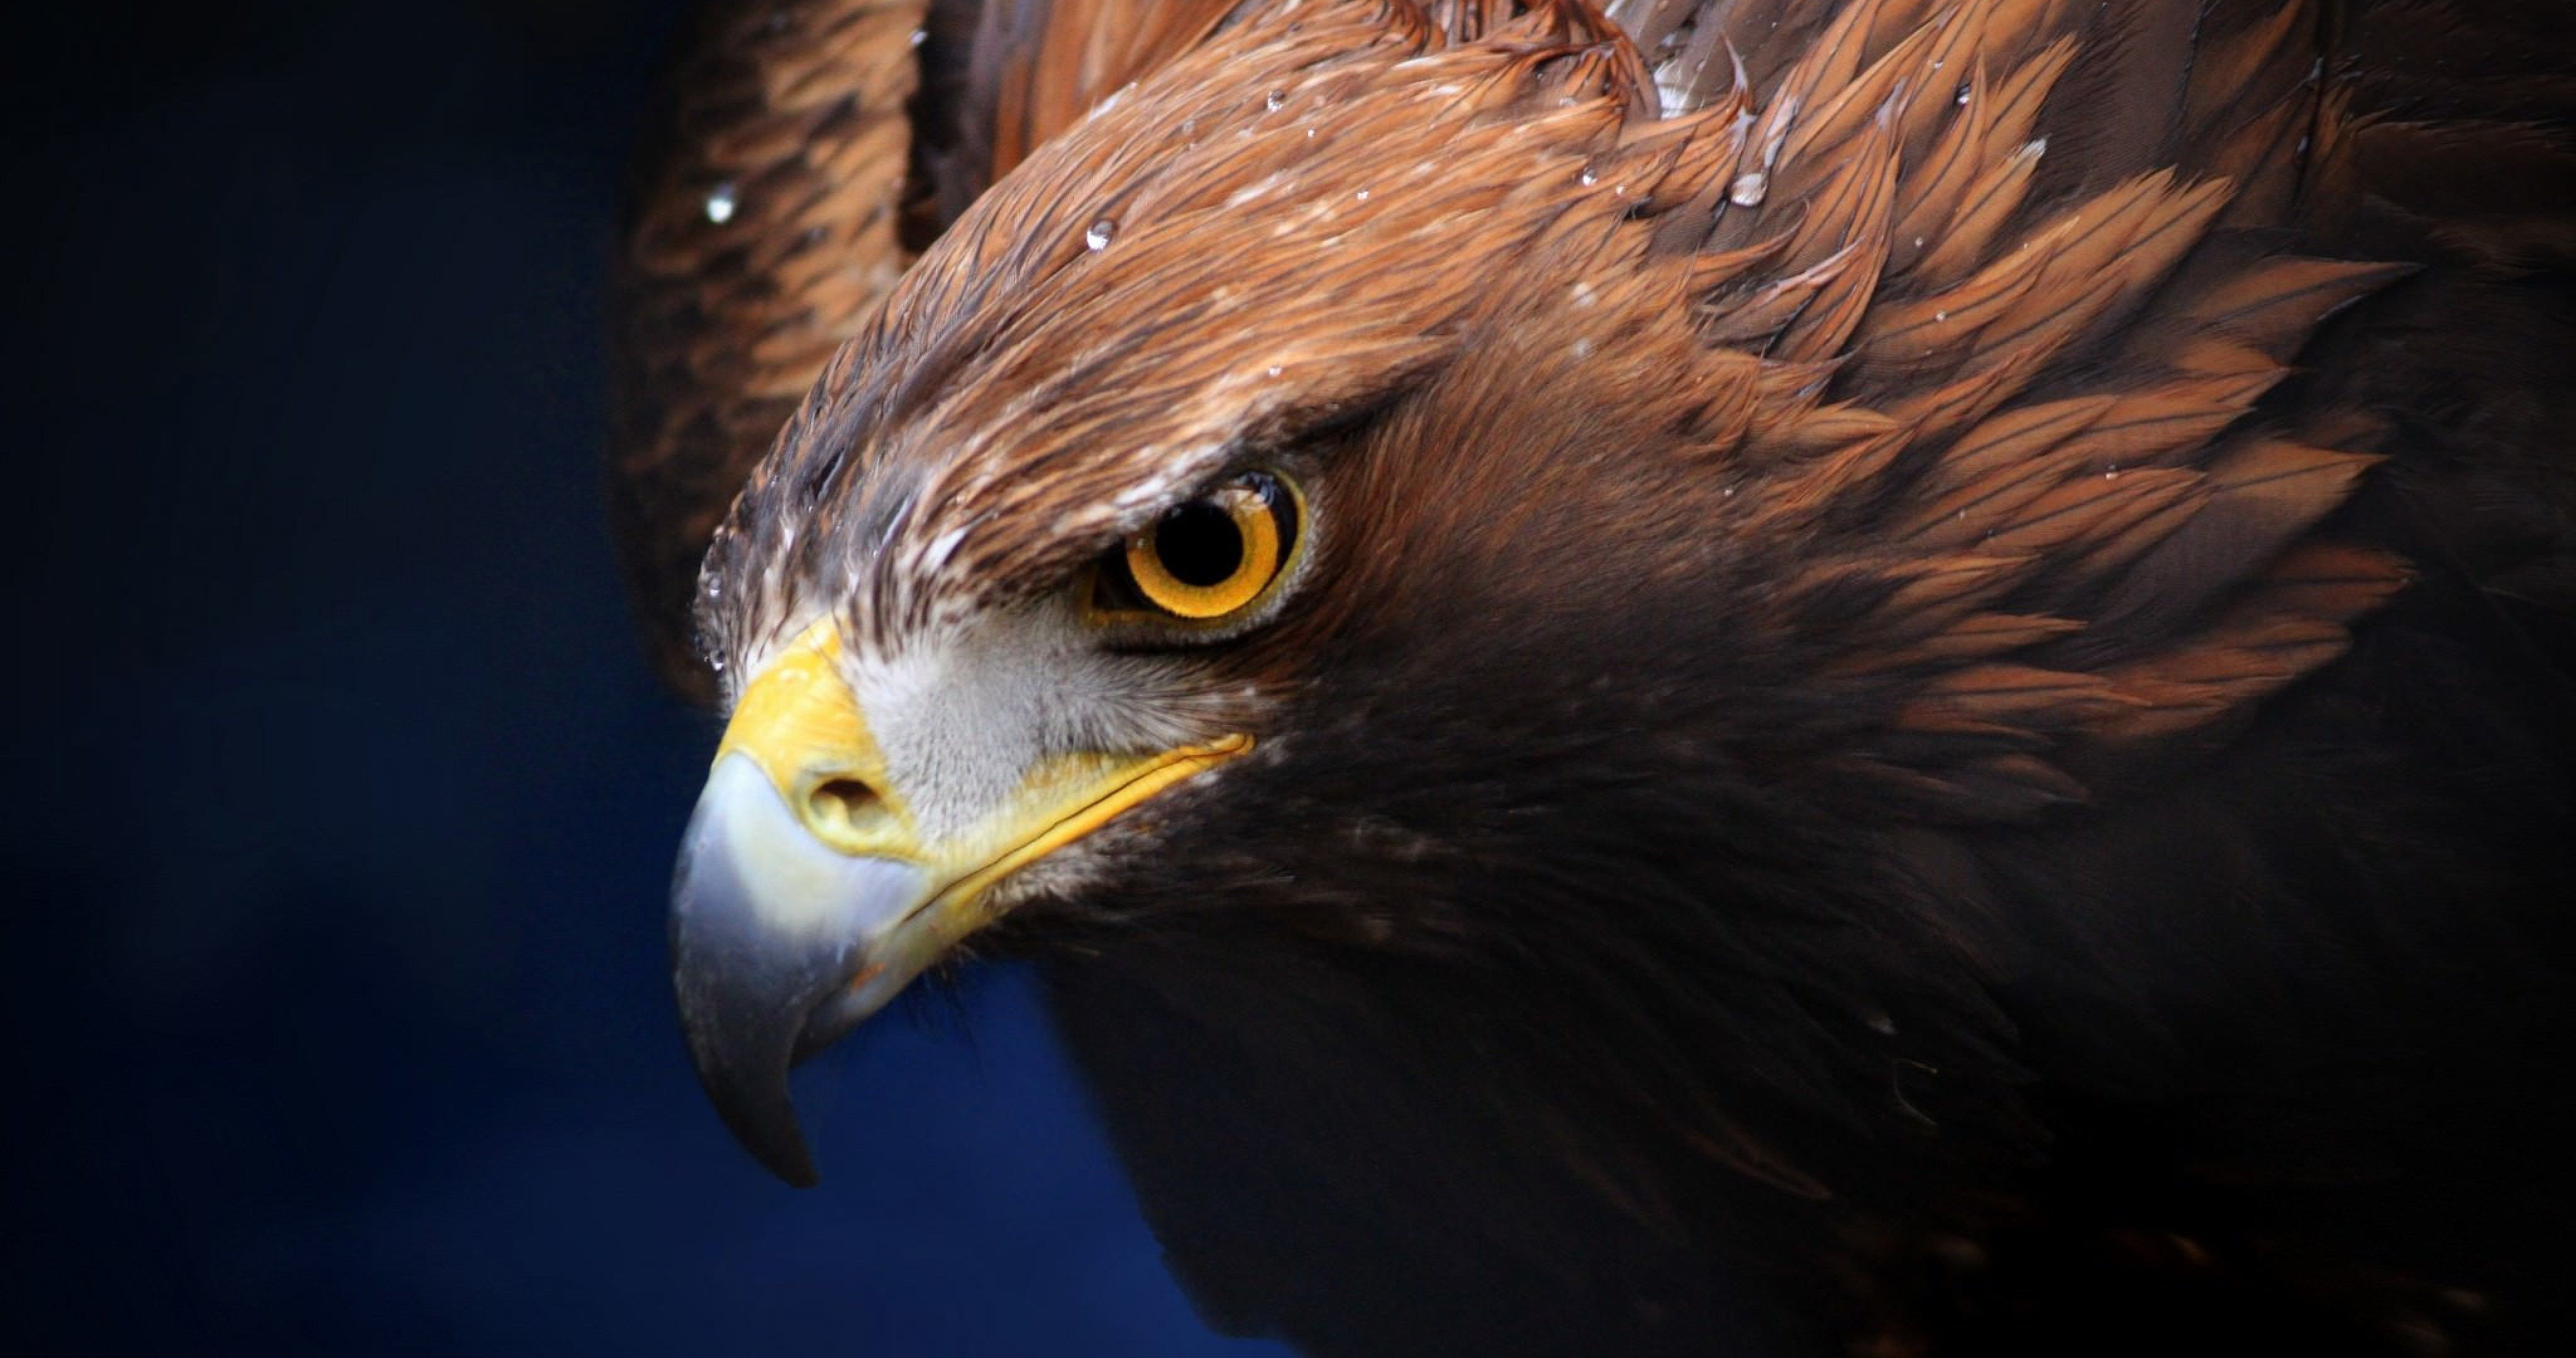 golden eagle 4k ultra hd wallpaper ololoshenka Eagle pictures 4096x2160